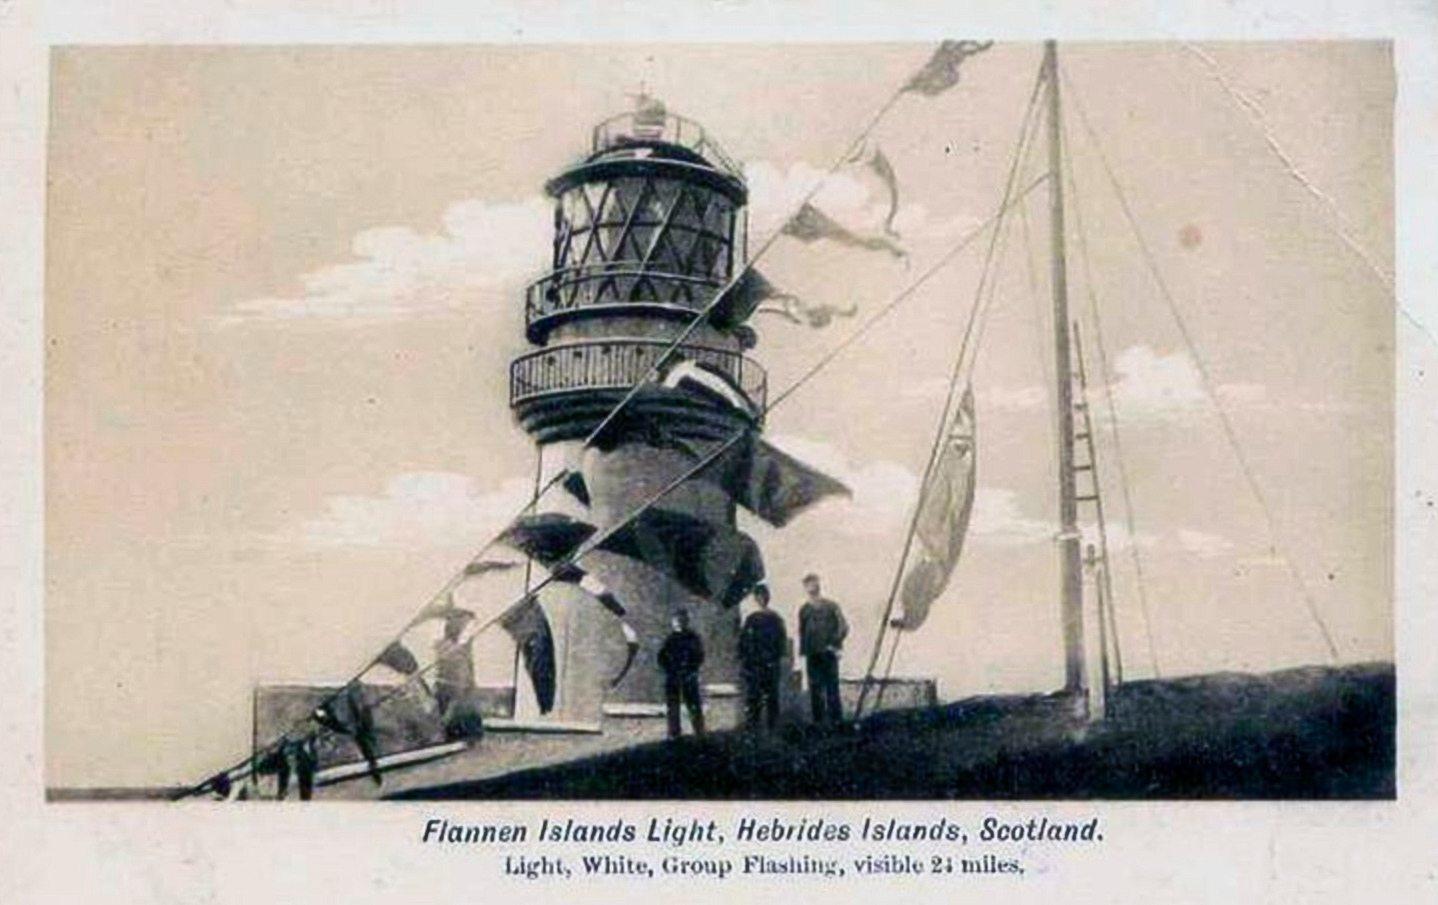 Vuurtoren van Flannan Isles